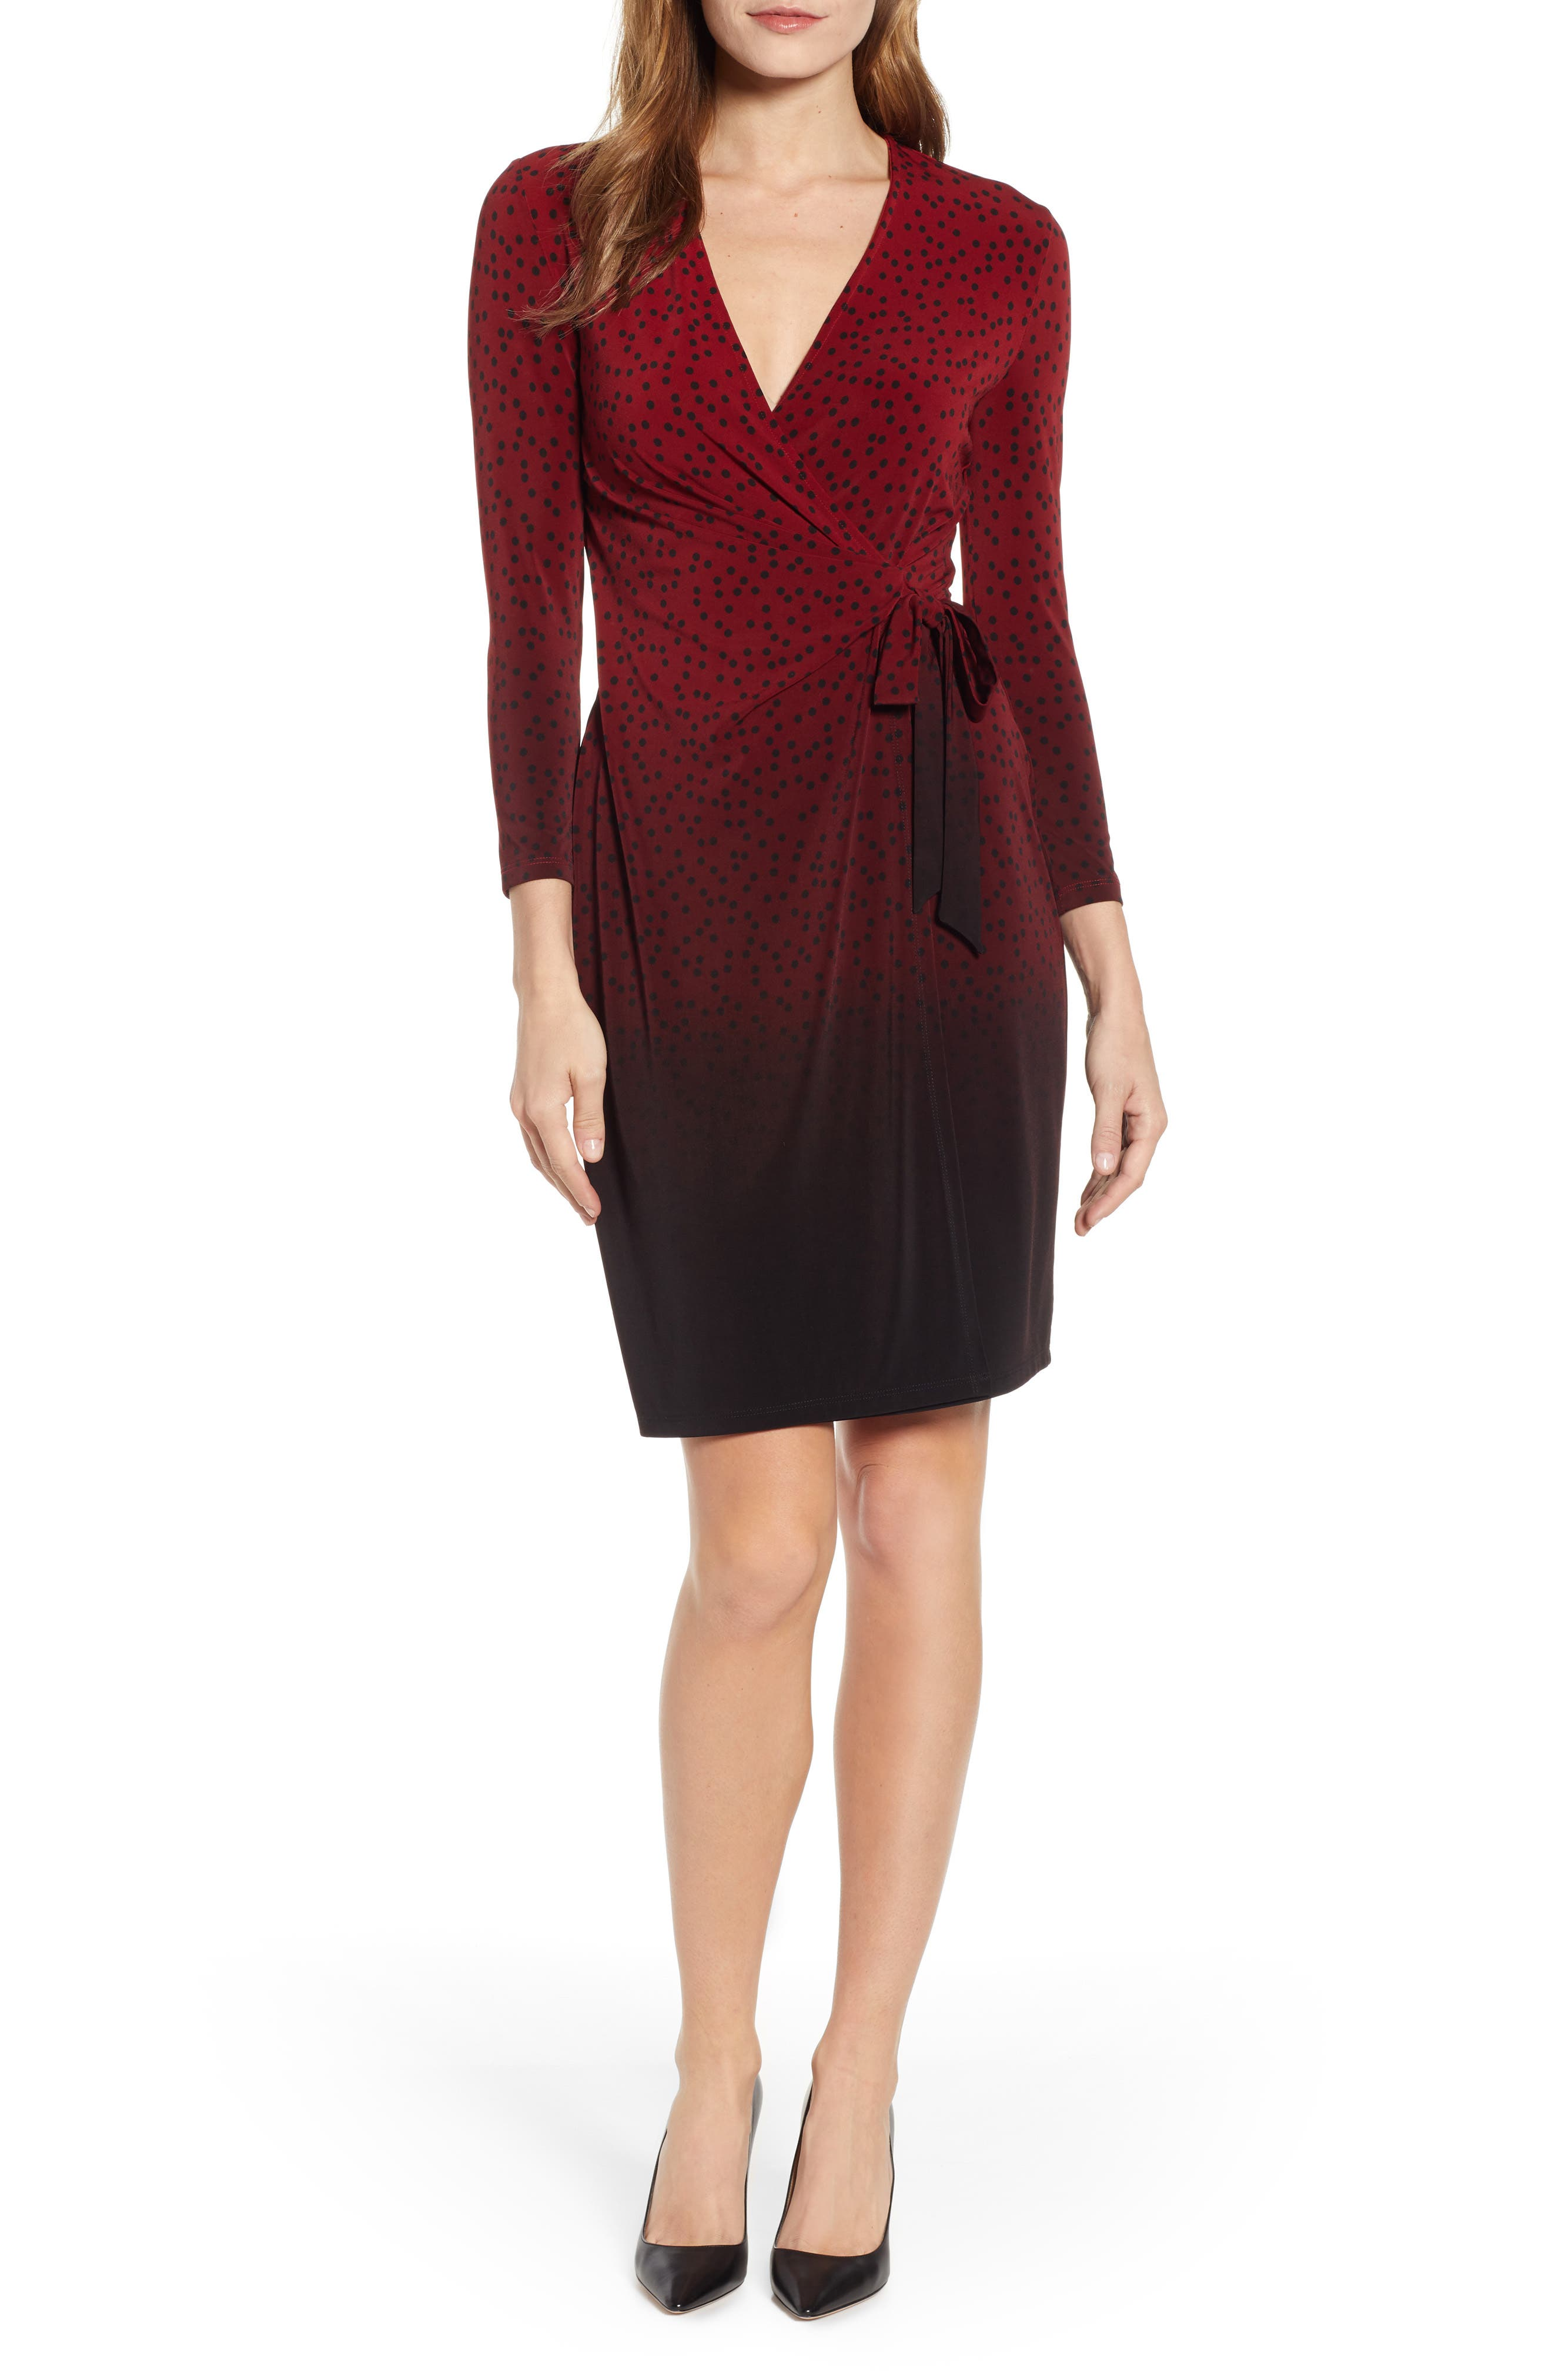 ANNE KLEIN,                             Camille Dot Faux Wrap Dress,                             Main thumbnail 1, color,                             DK TITIAN RED/ ANNE BLK COMBO